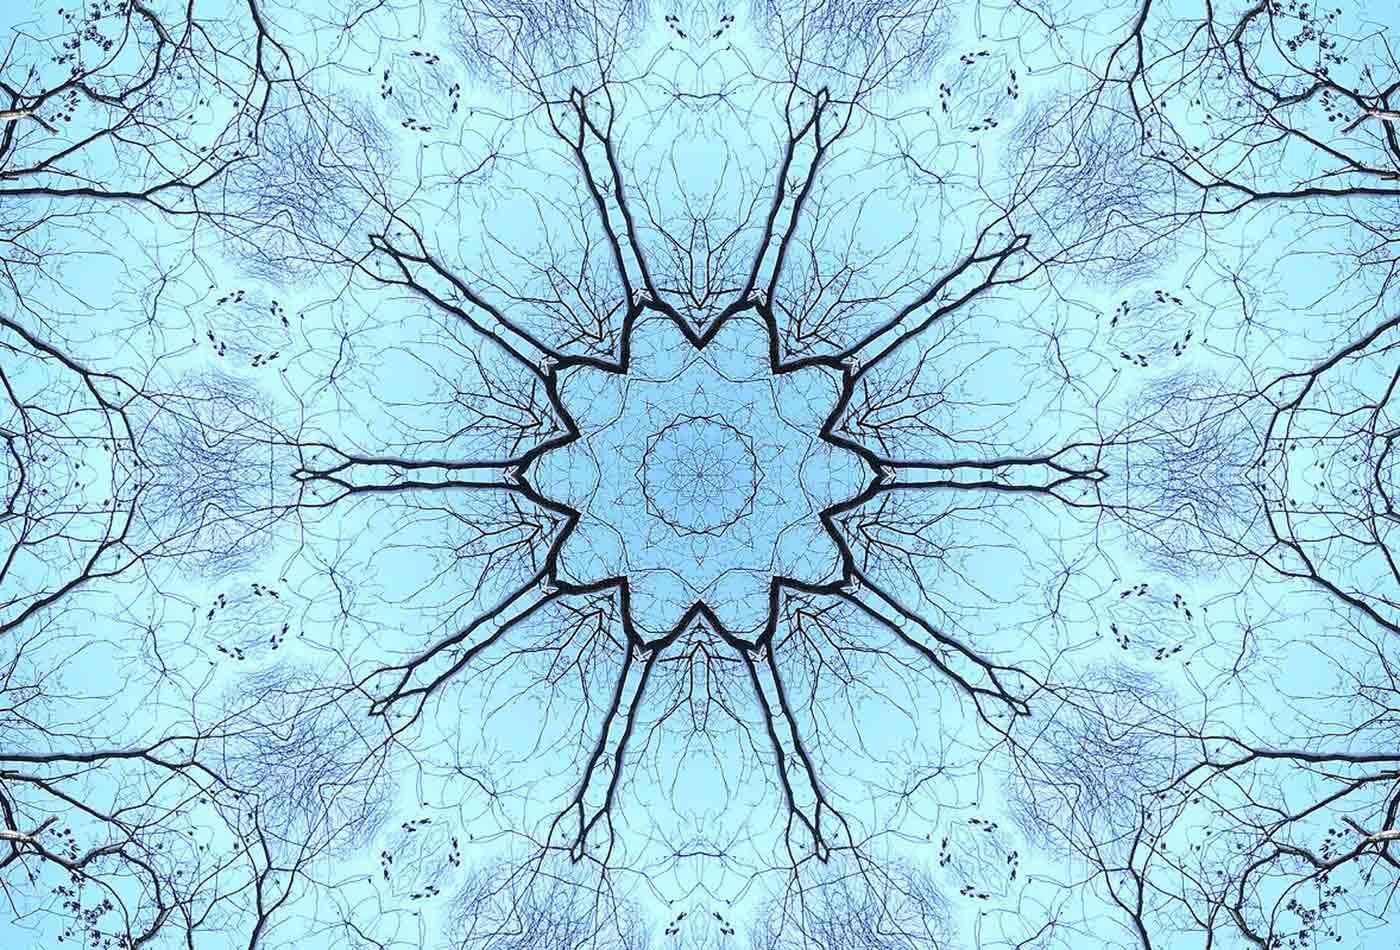 Nature-kaleidoscope.